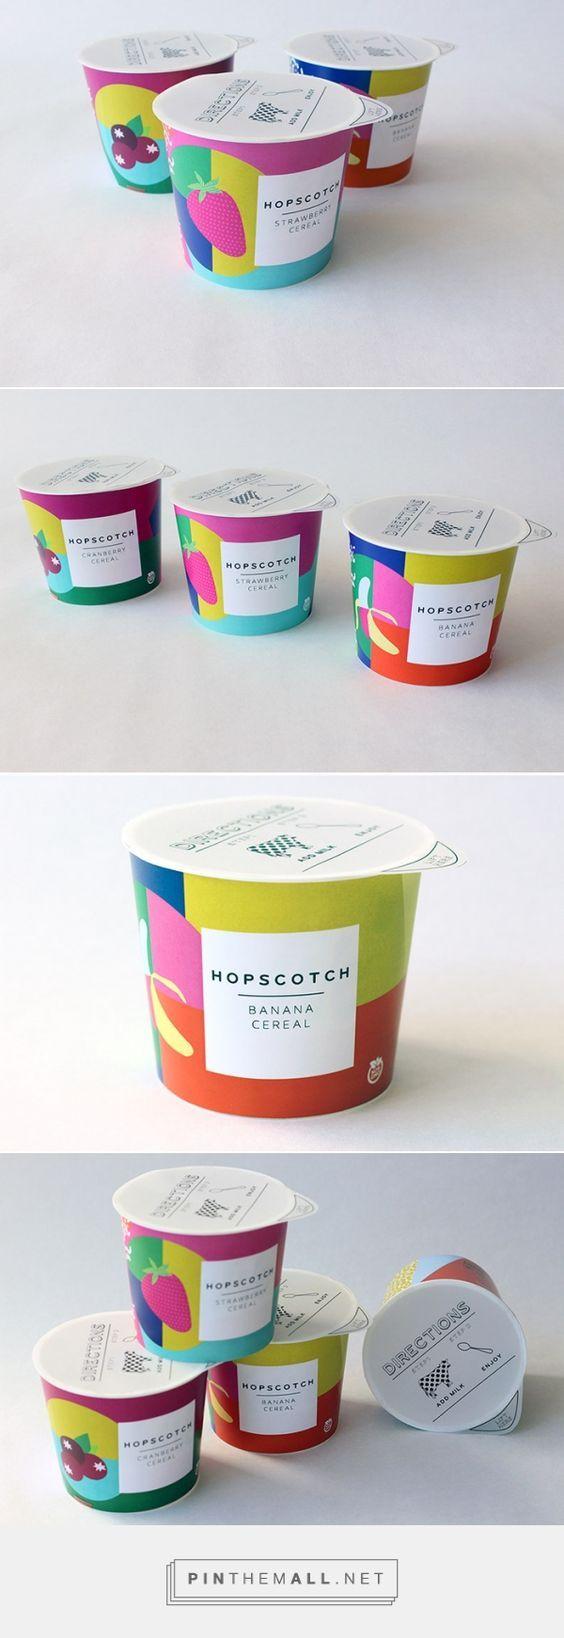 Hopscotch To-Go Cereal Packaging | Fivestar Branding – Design and Branding Agency & Inspiration Gallery | Professional Logo and Website Design